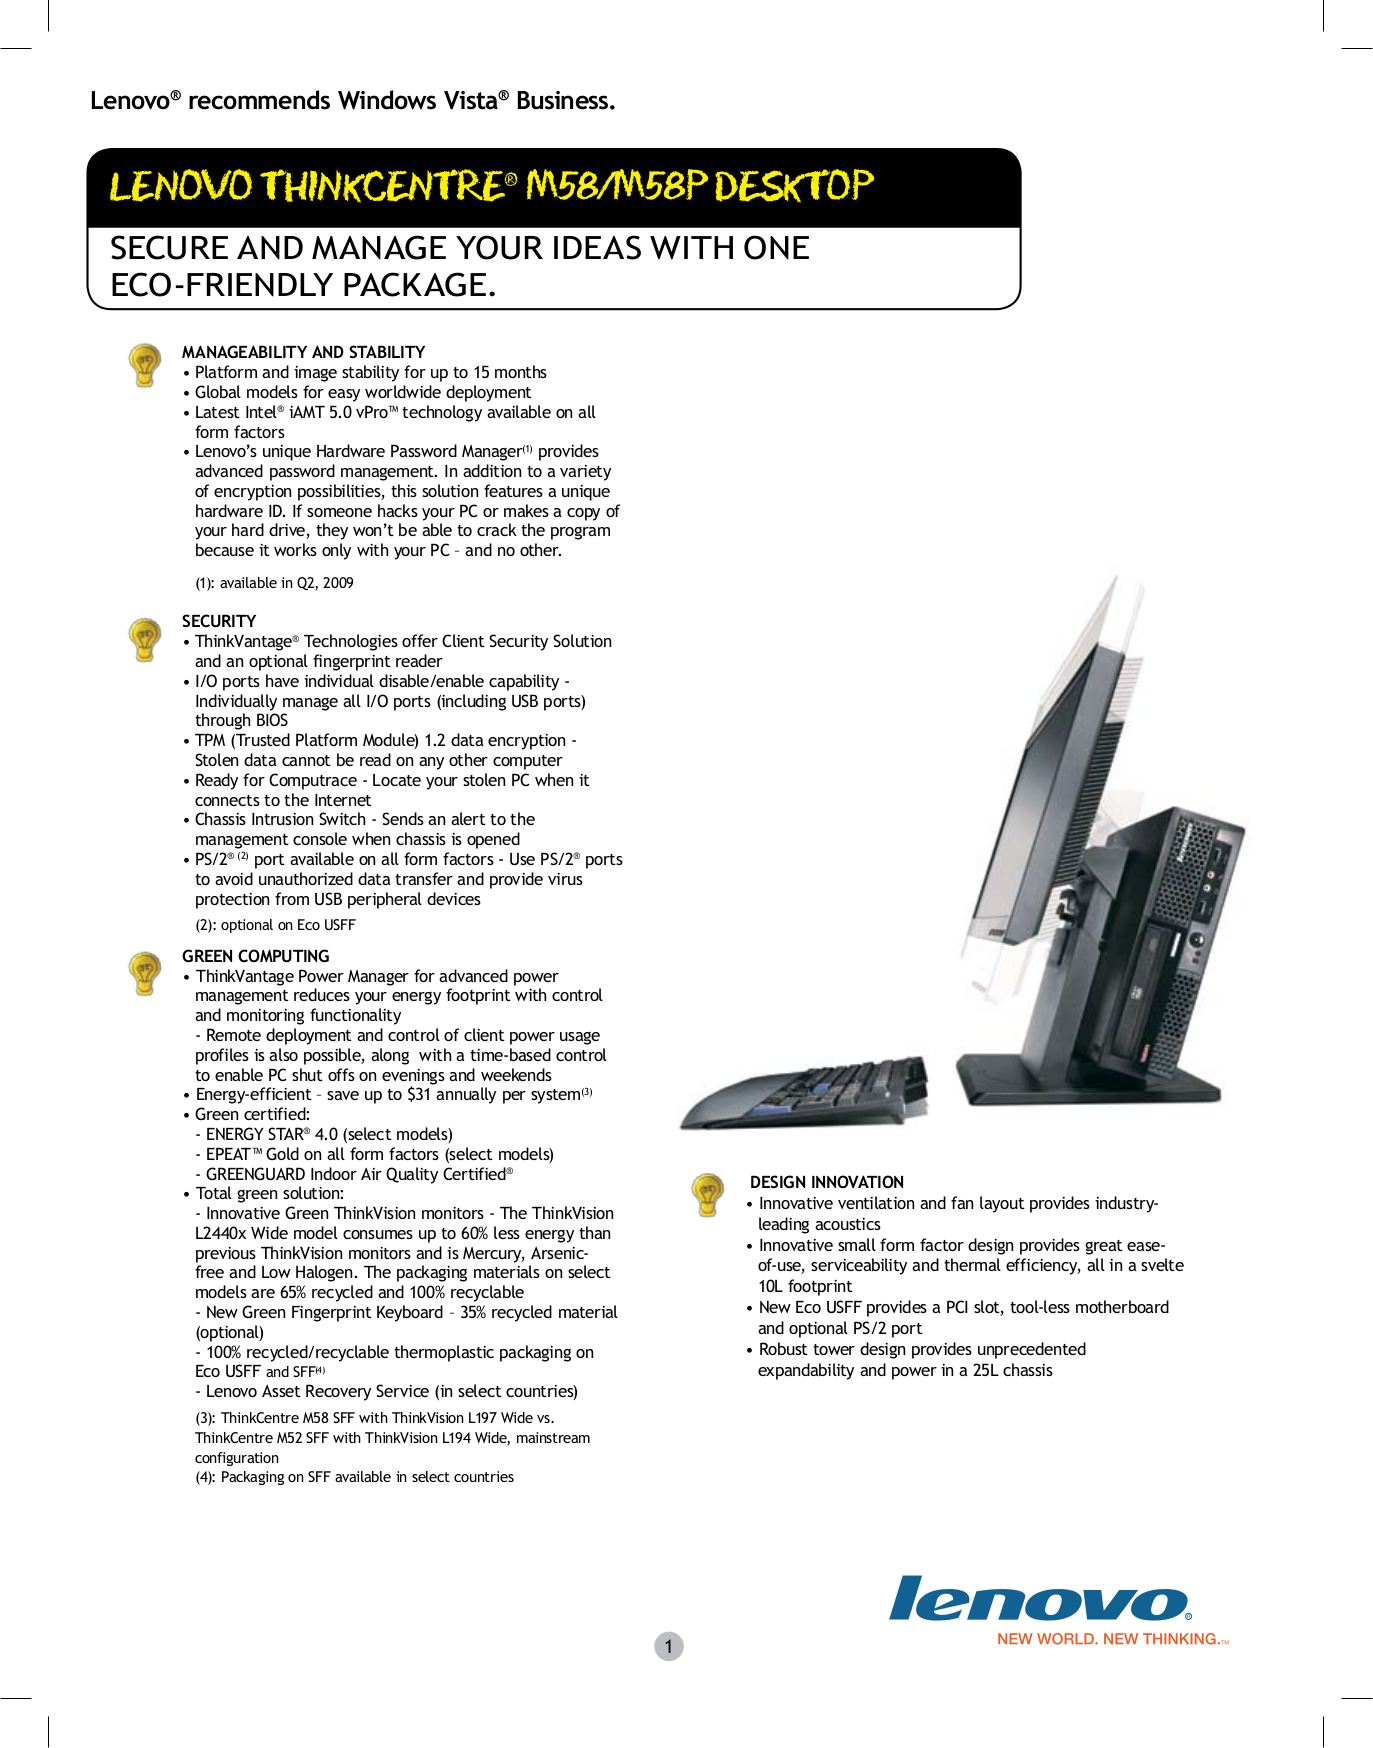 pdf for Lenovo Desktop ThinkCentre M58 7348 manual